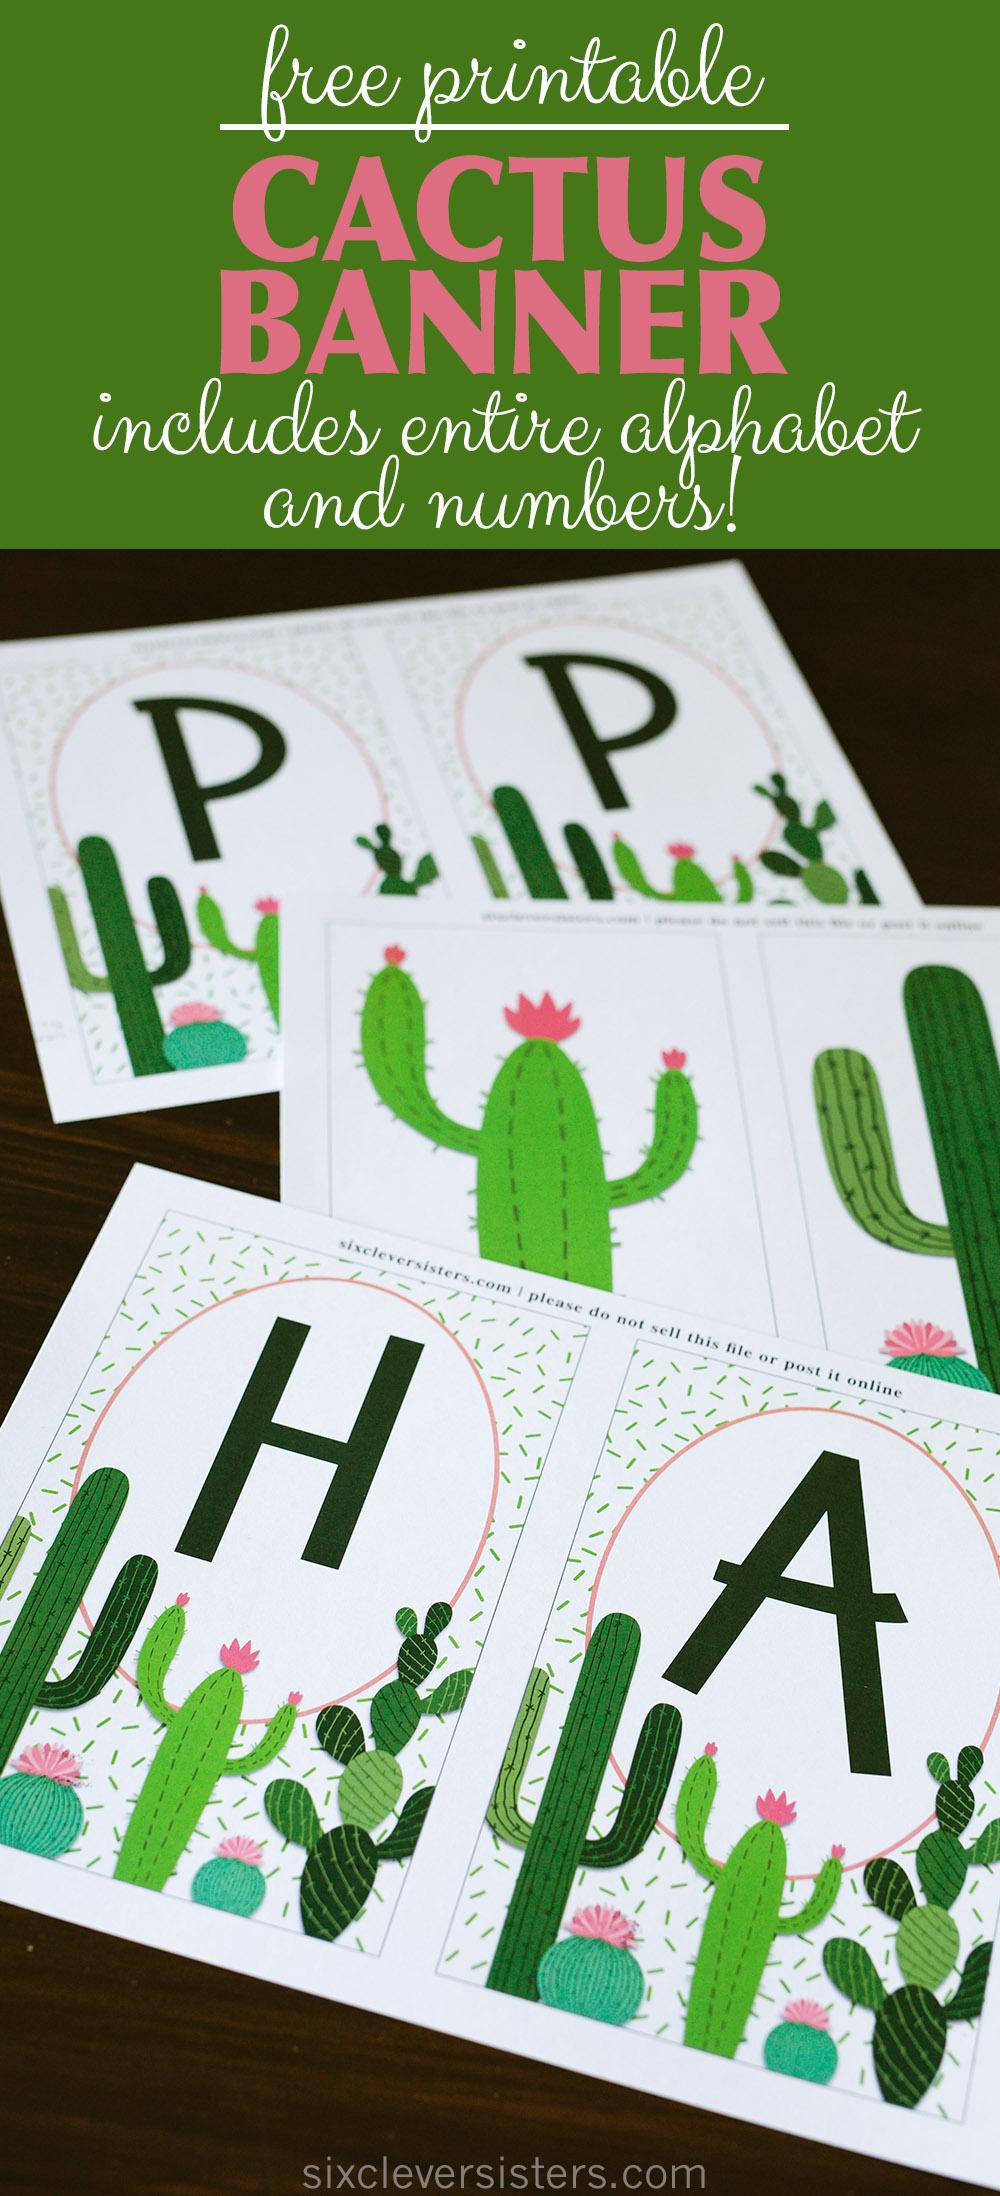 photo regarding Cactus Printable identified as Cactus Banner No cost Printable - 6 Smart Sisters